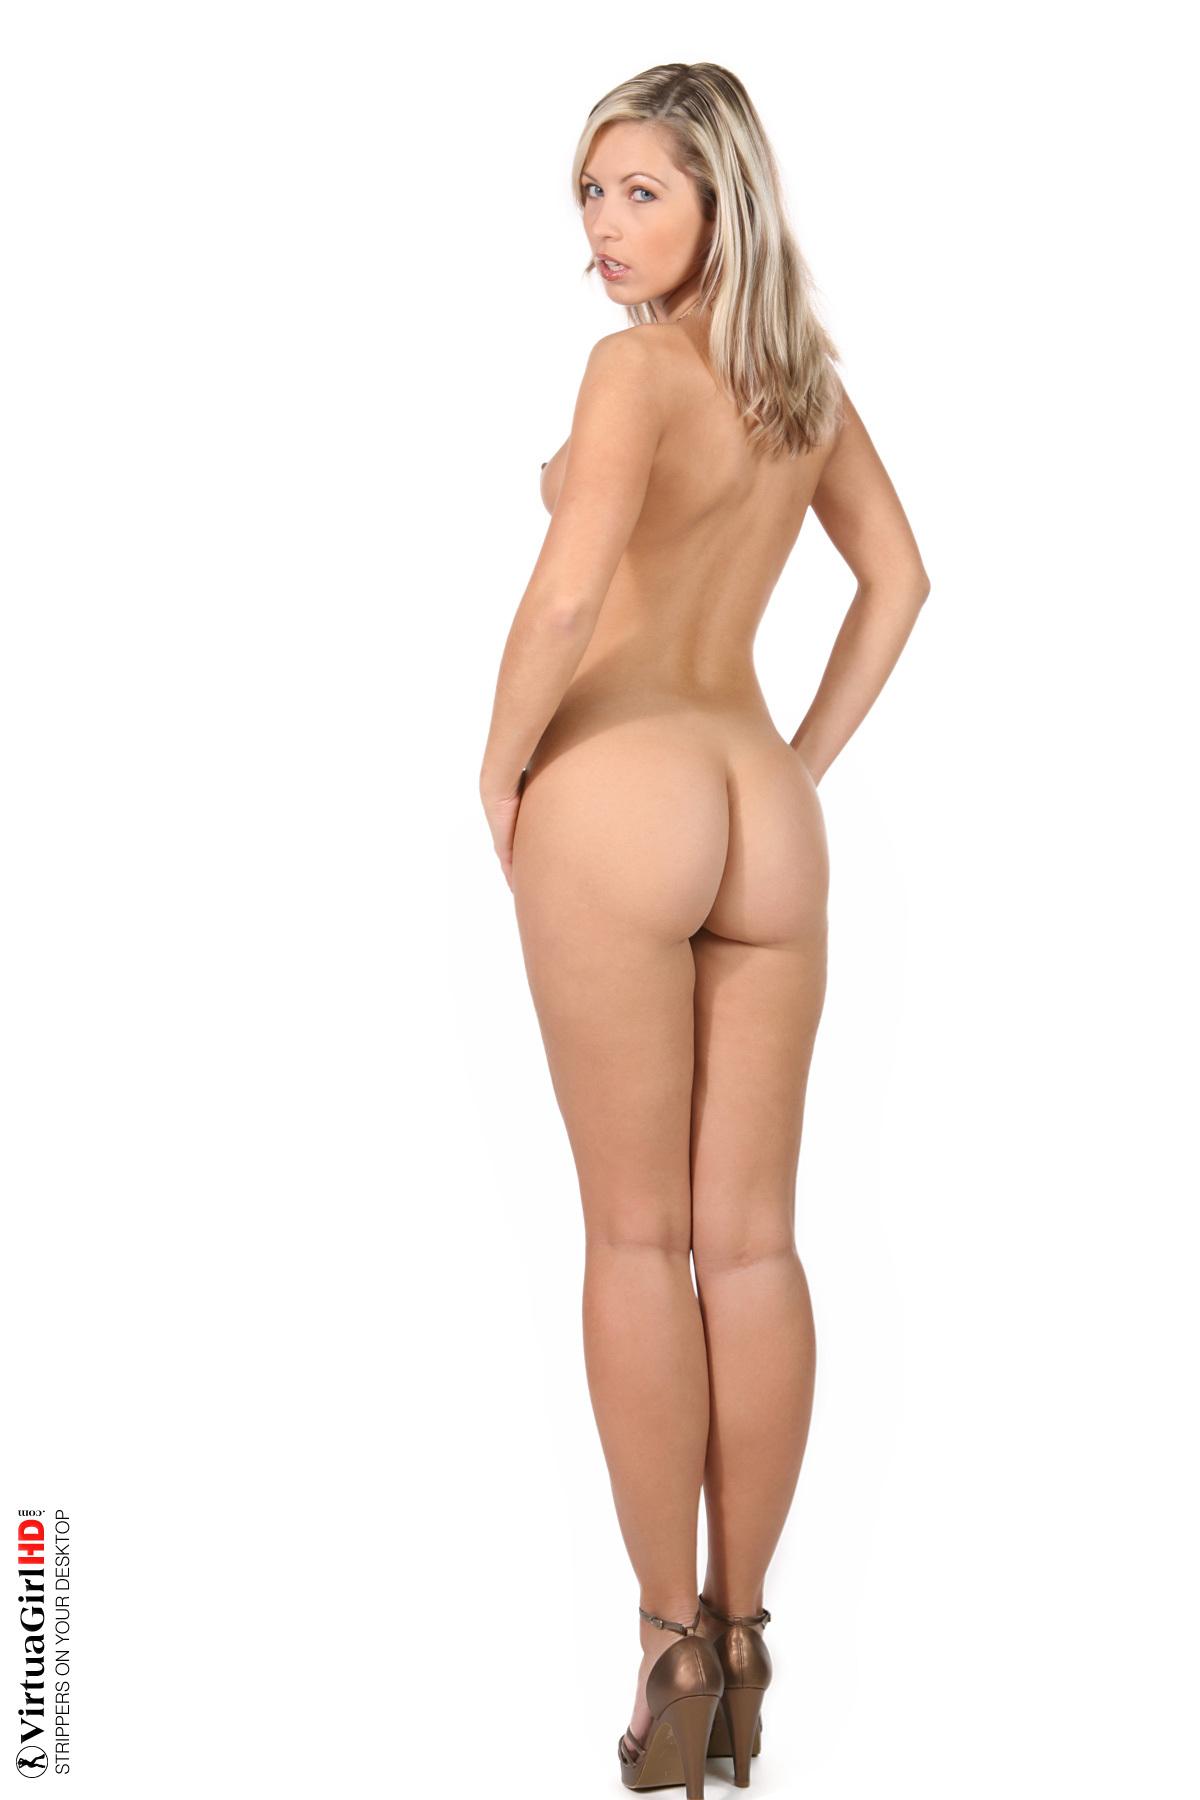 chubby sexy girls nude blond hair